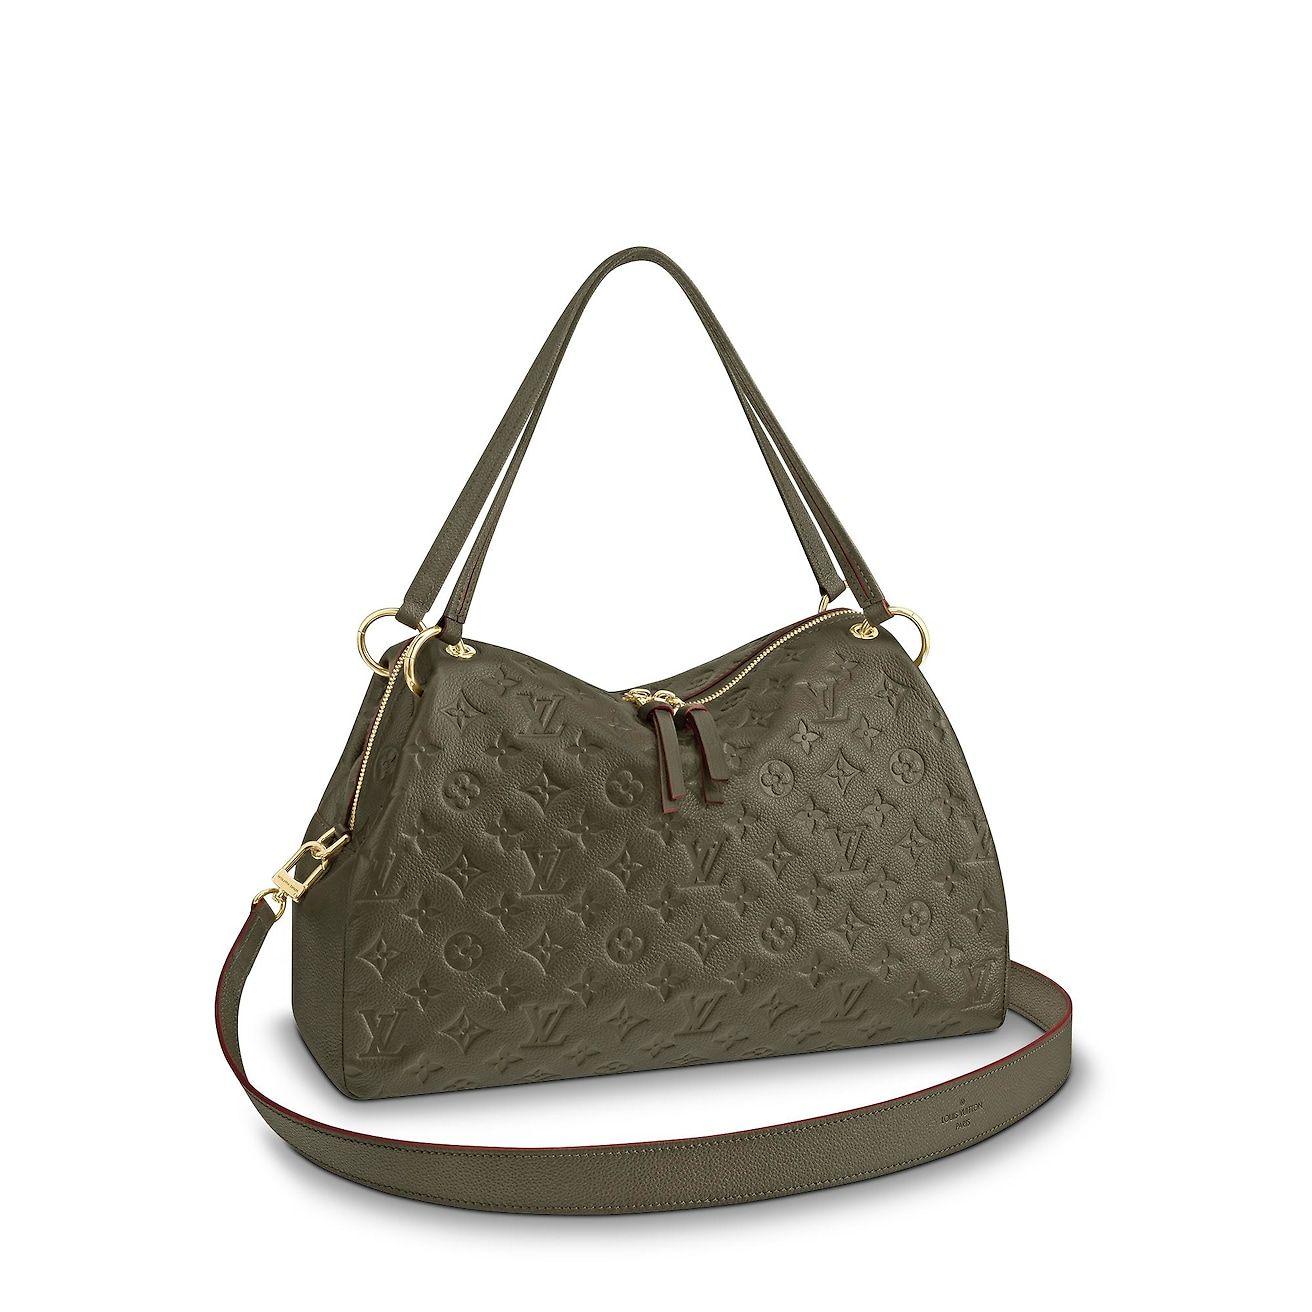 92e494d52529 View 1 - Monogram Empreinte Leather HANDBAGS Shoulder Bags   Totes Ponthieu  PM